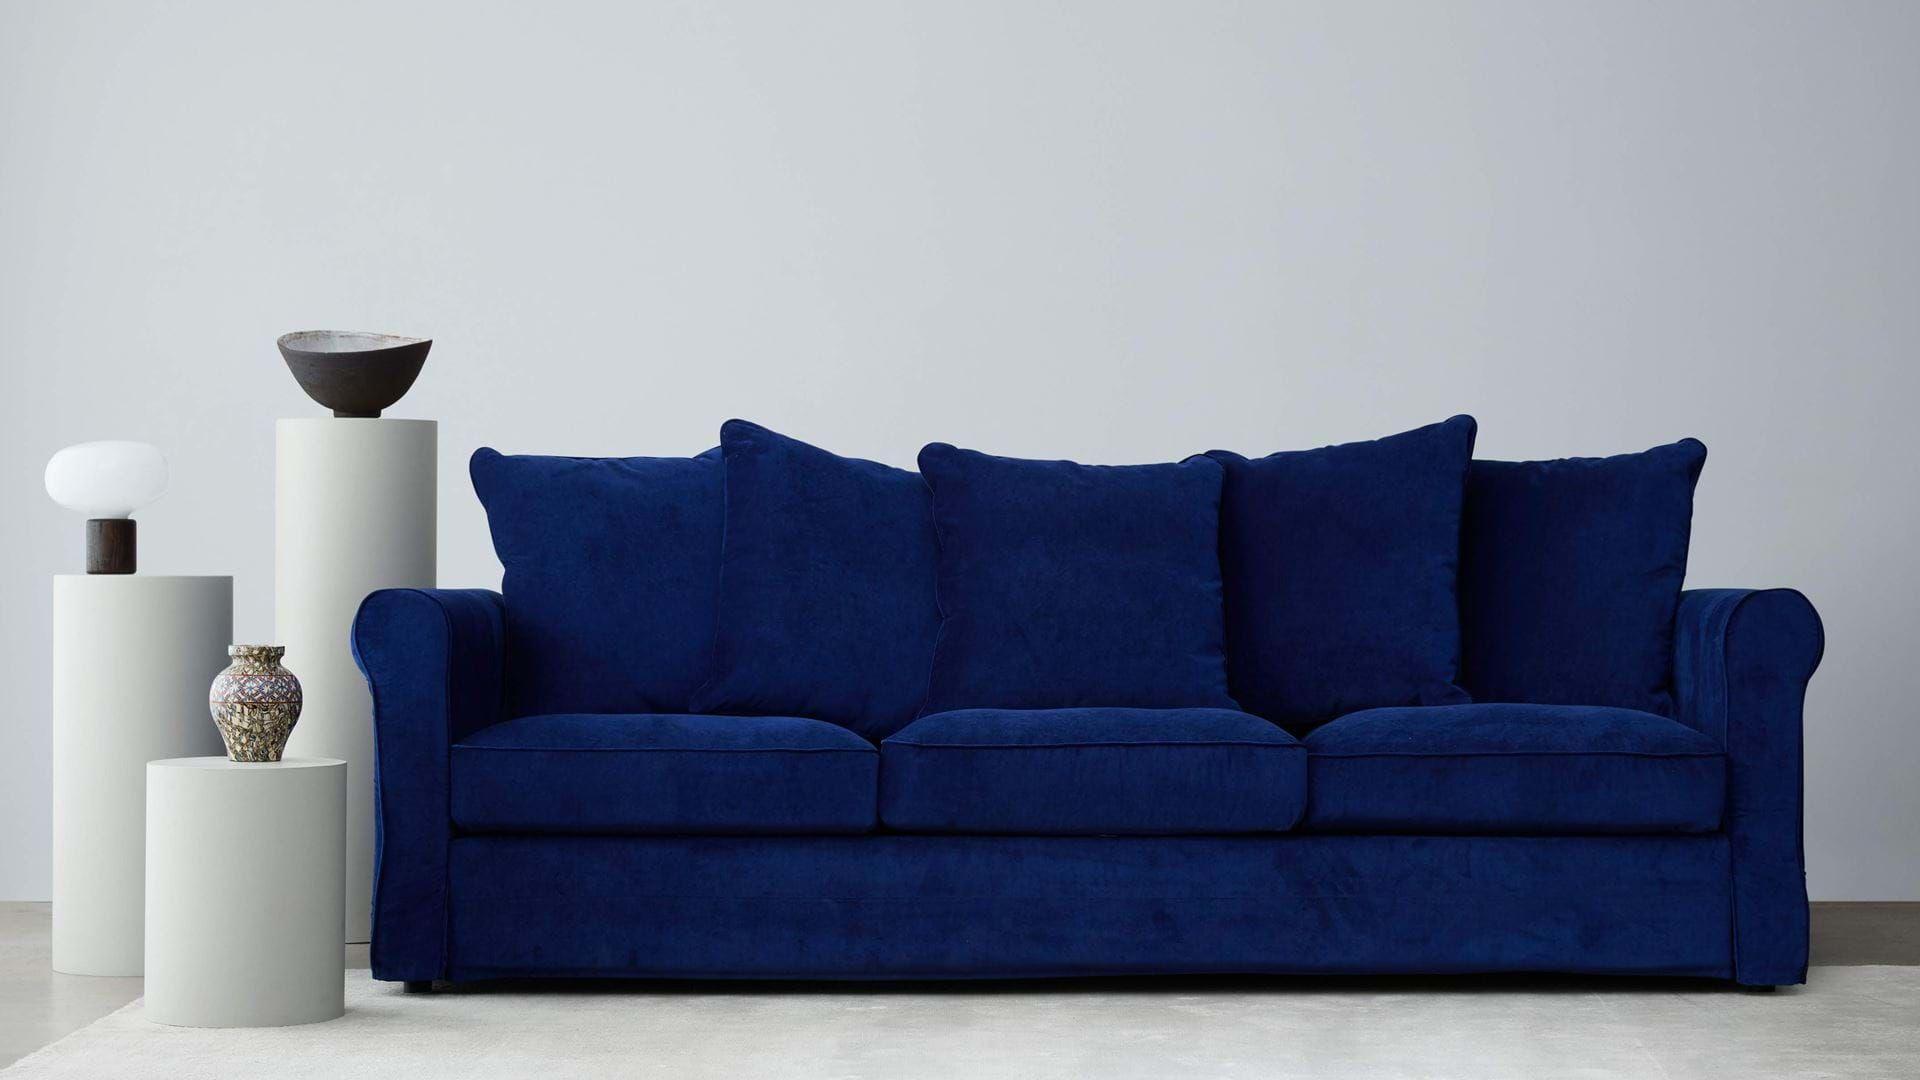 Bezug Fur 3er Sofa Gronlid Bemz In 2020 Sofa Covers Sand Beige Ektorp Sofa